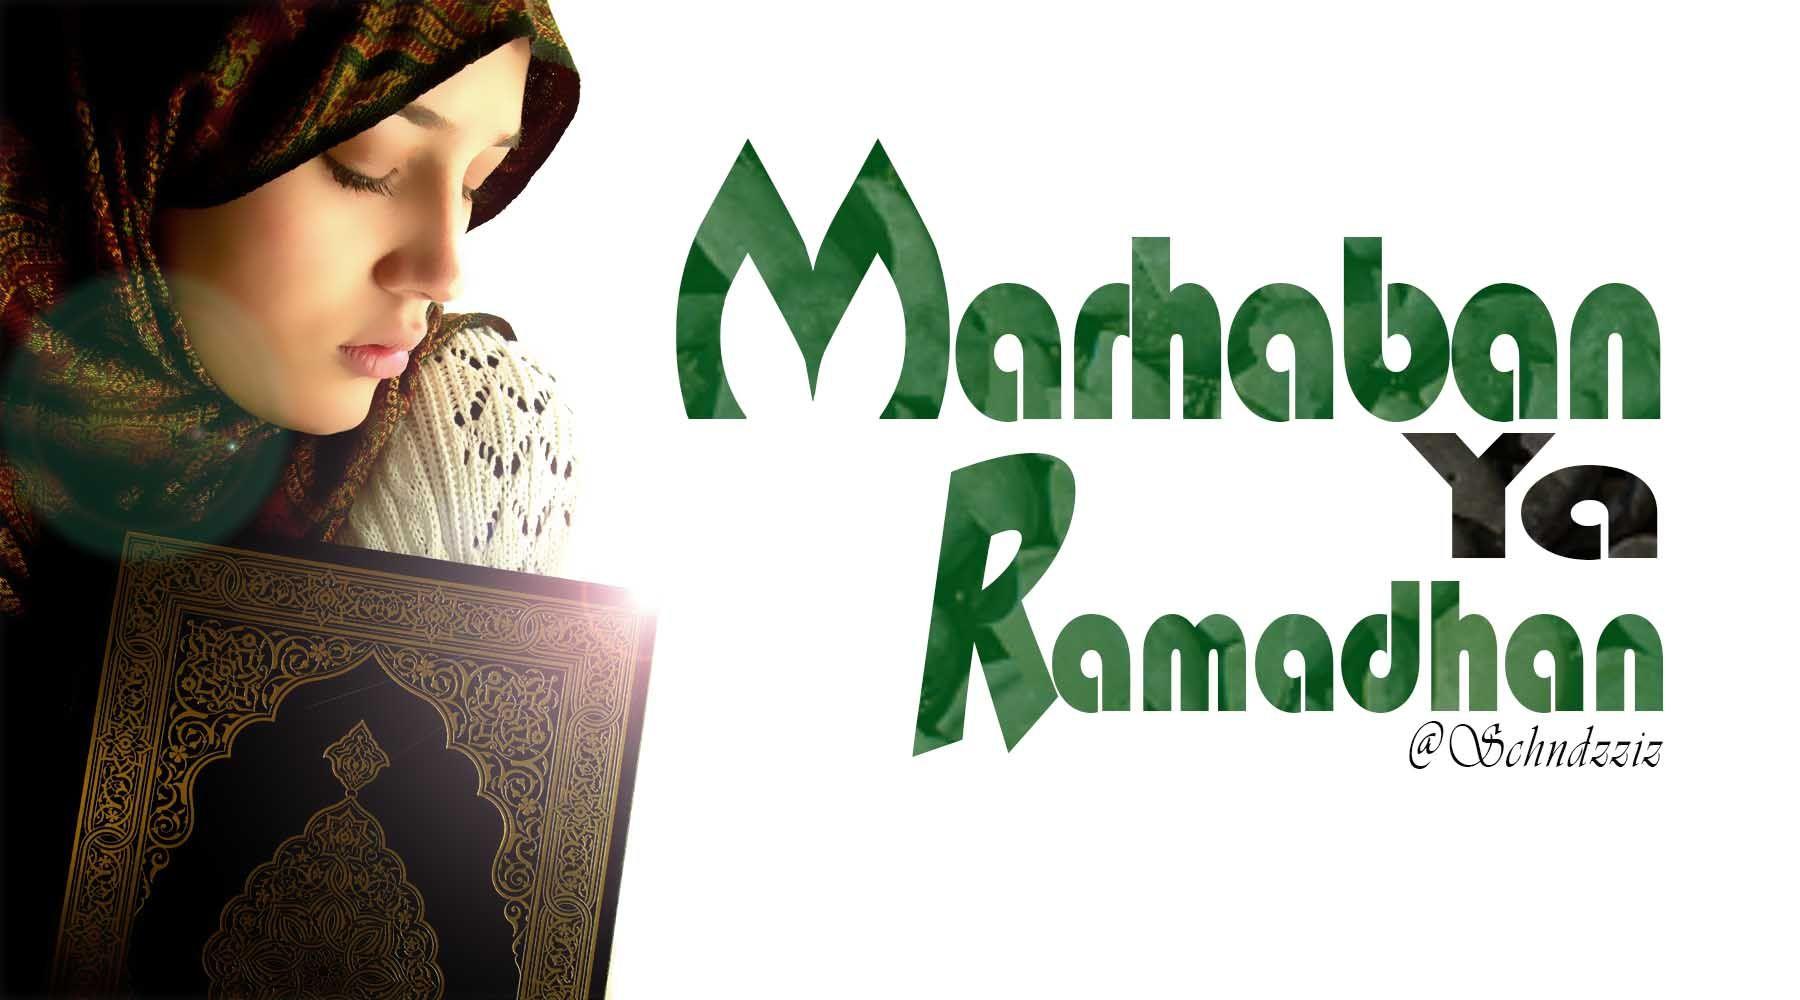 Kata Kata Ucapan Malam Menyambut Bulan Suci Ramadhan Tahun 2018